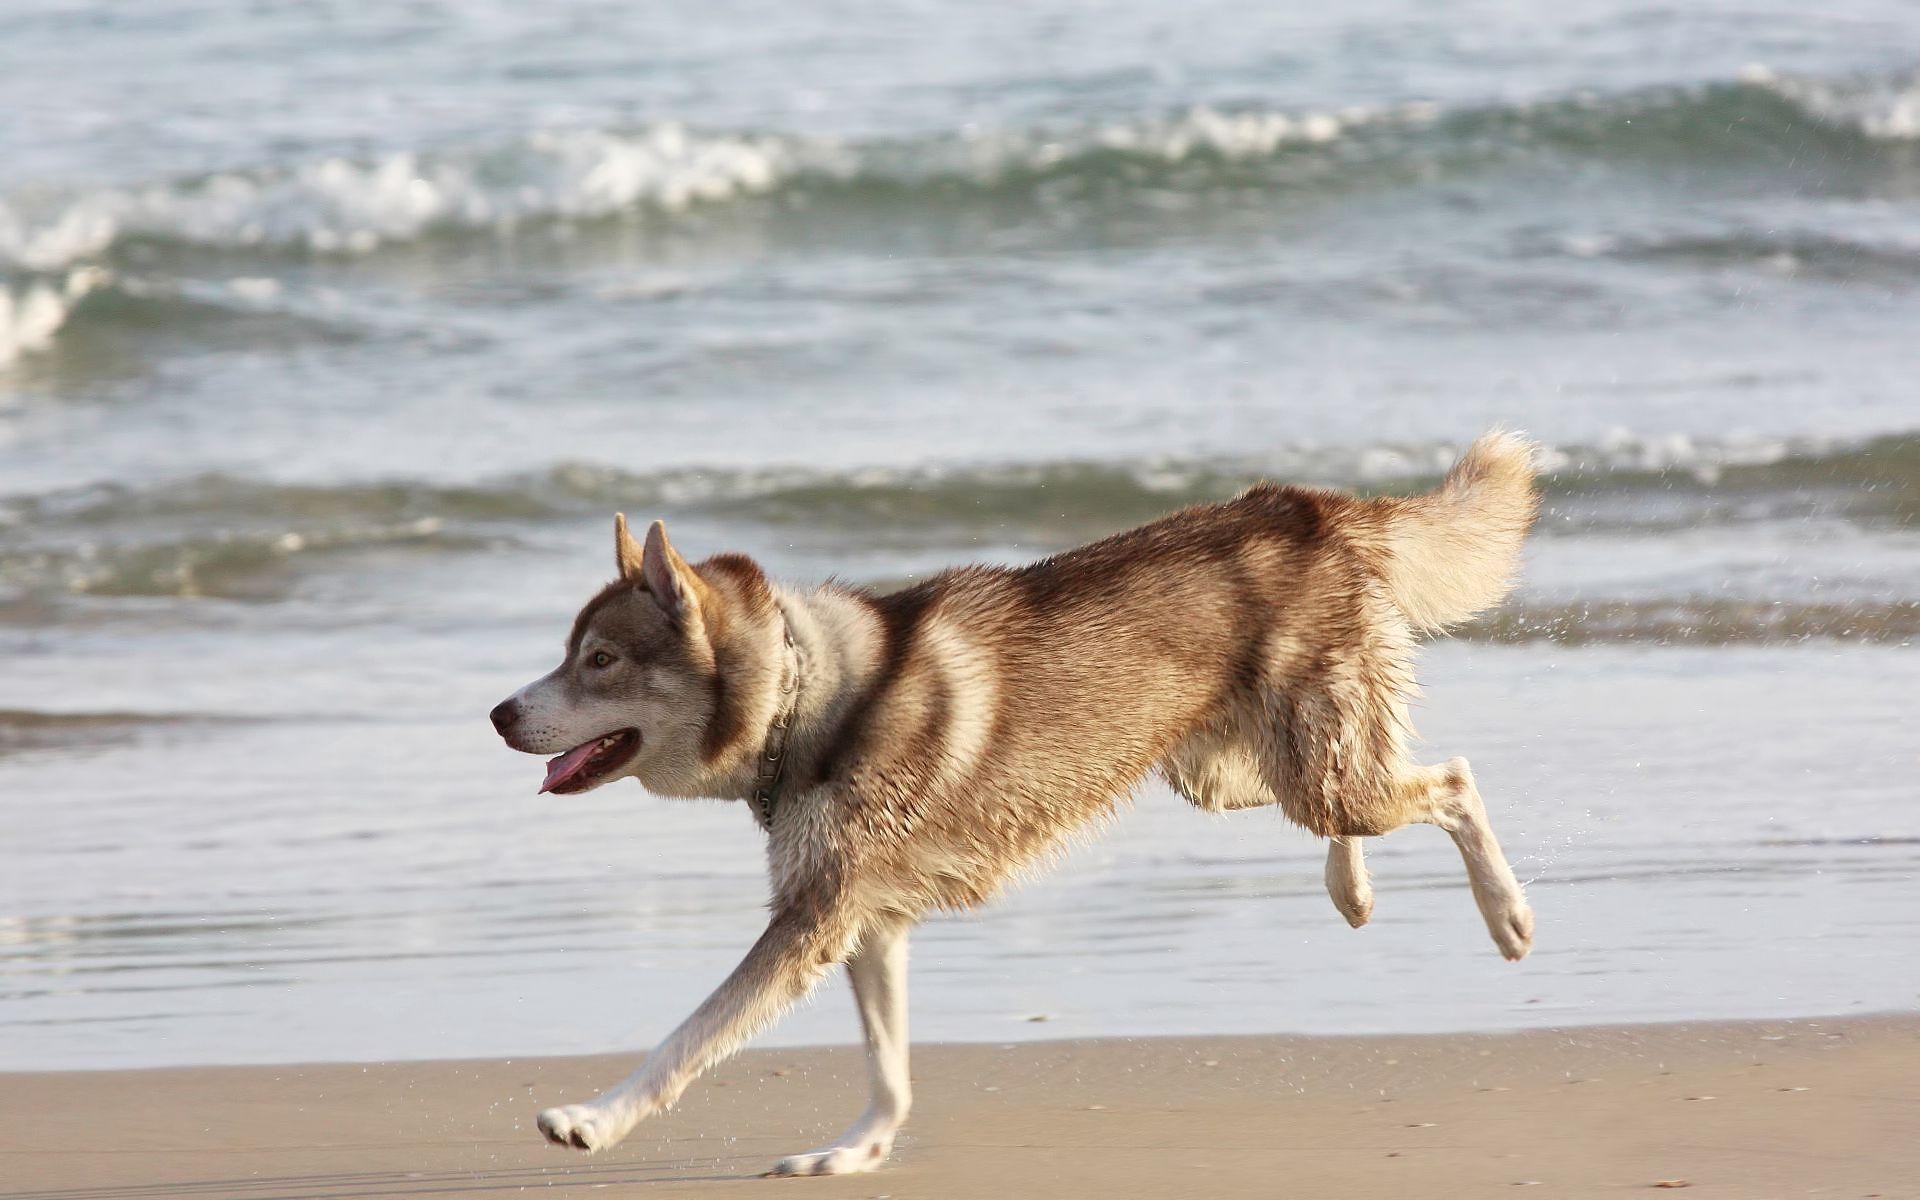 57379 download wallpaper Animals, Husky, Haska, Dog, Sea, Shore, Bank, Run Away, Run screensavers and pictures for free